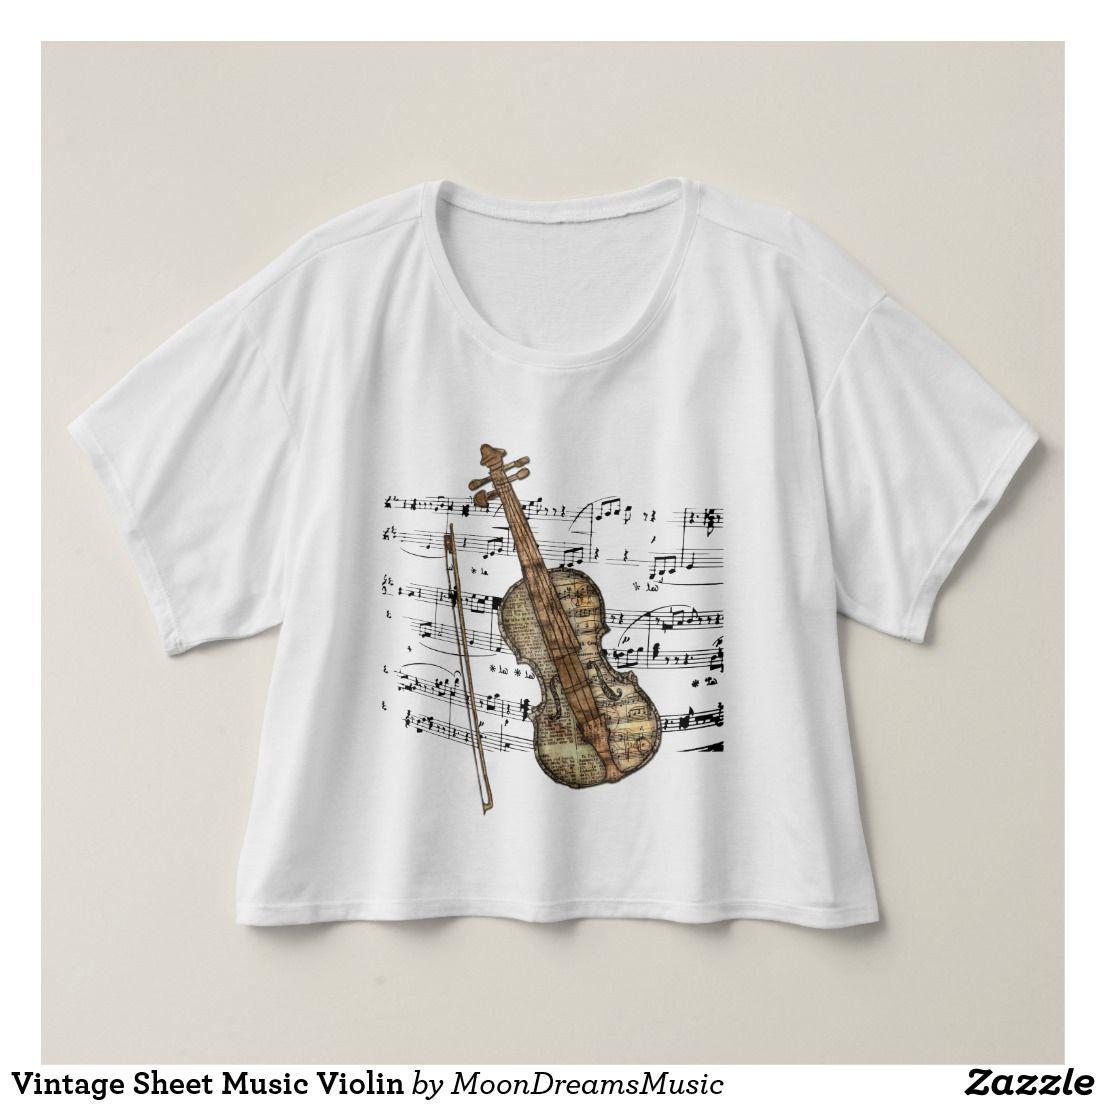 Vintage Sheet Music Violin T-shirt | Zazzle.com #vintagesheetmusic